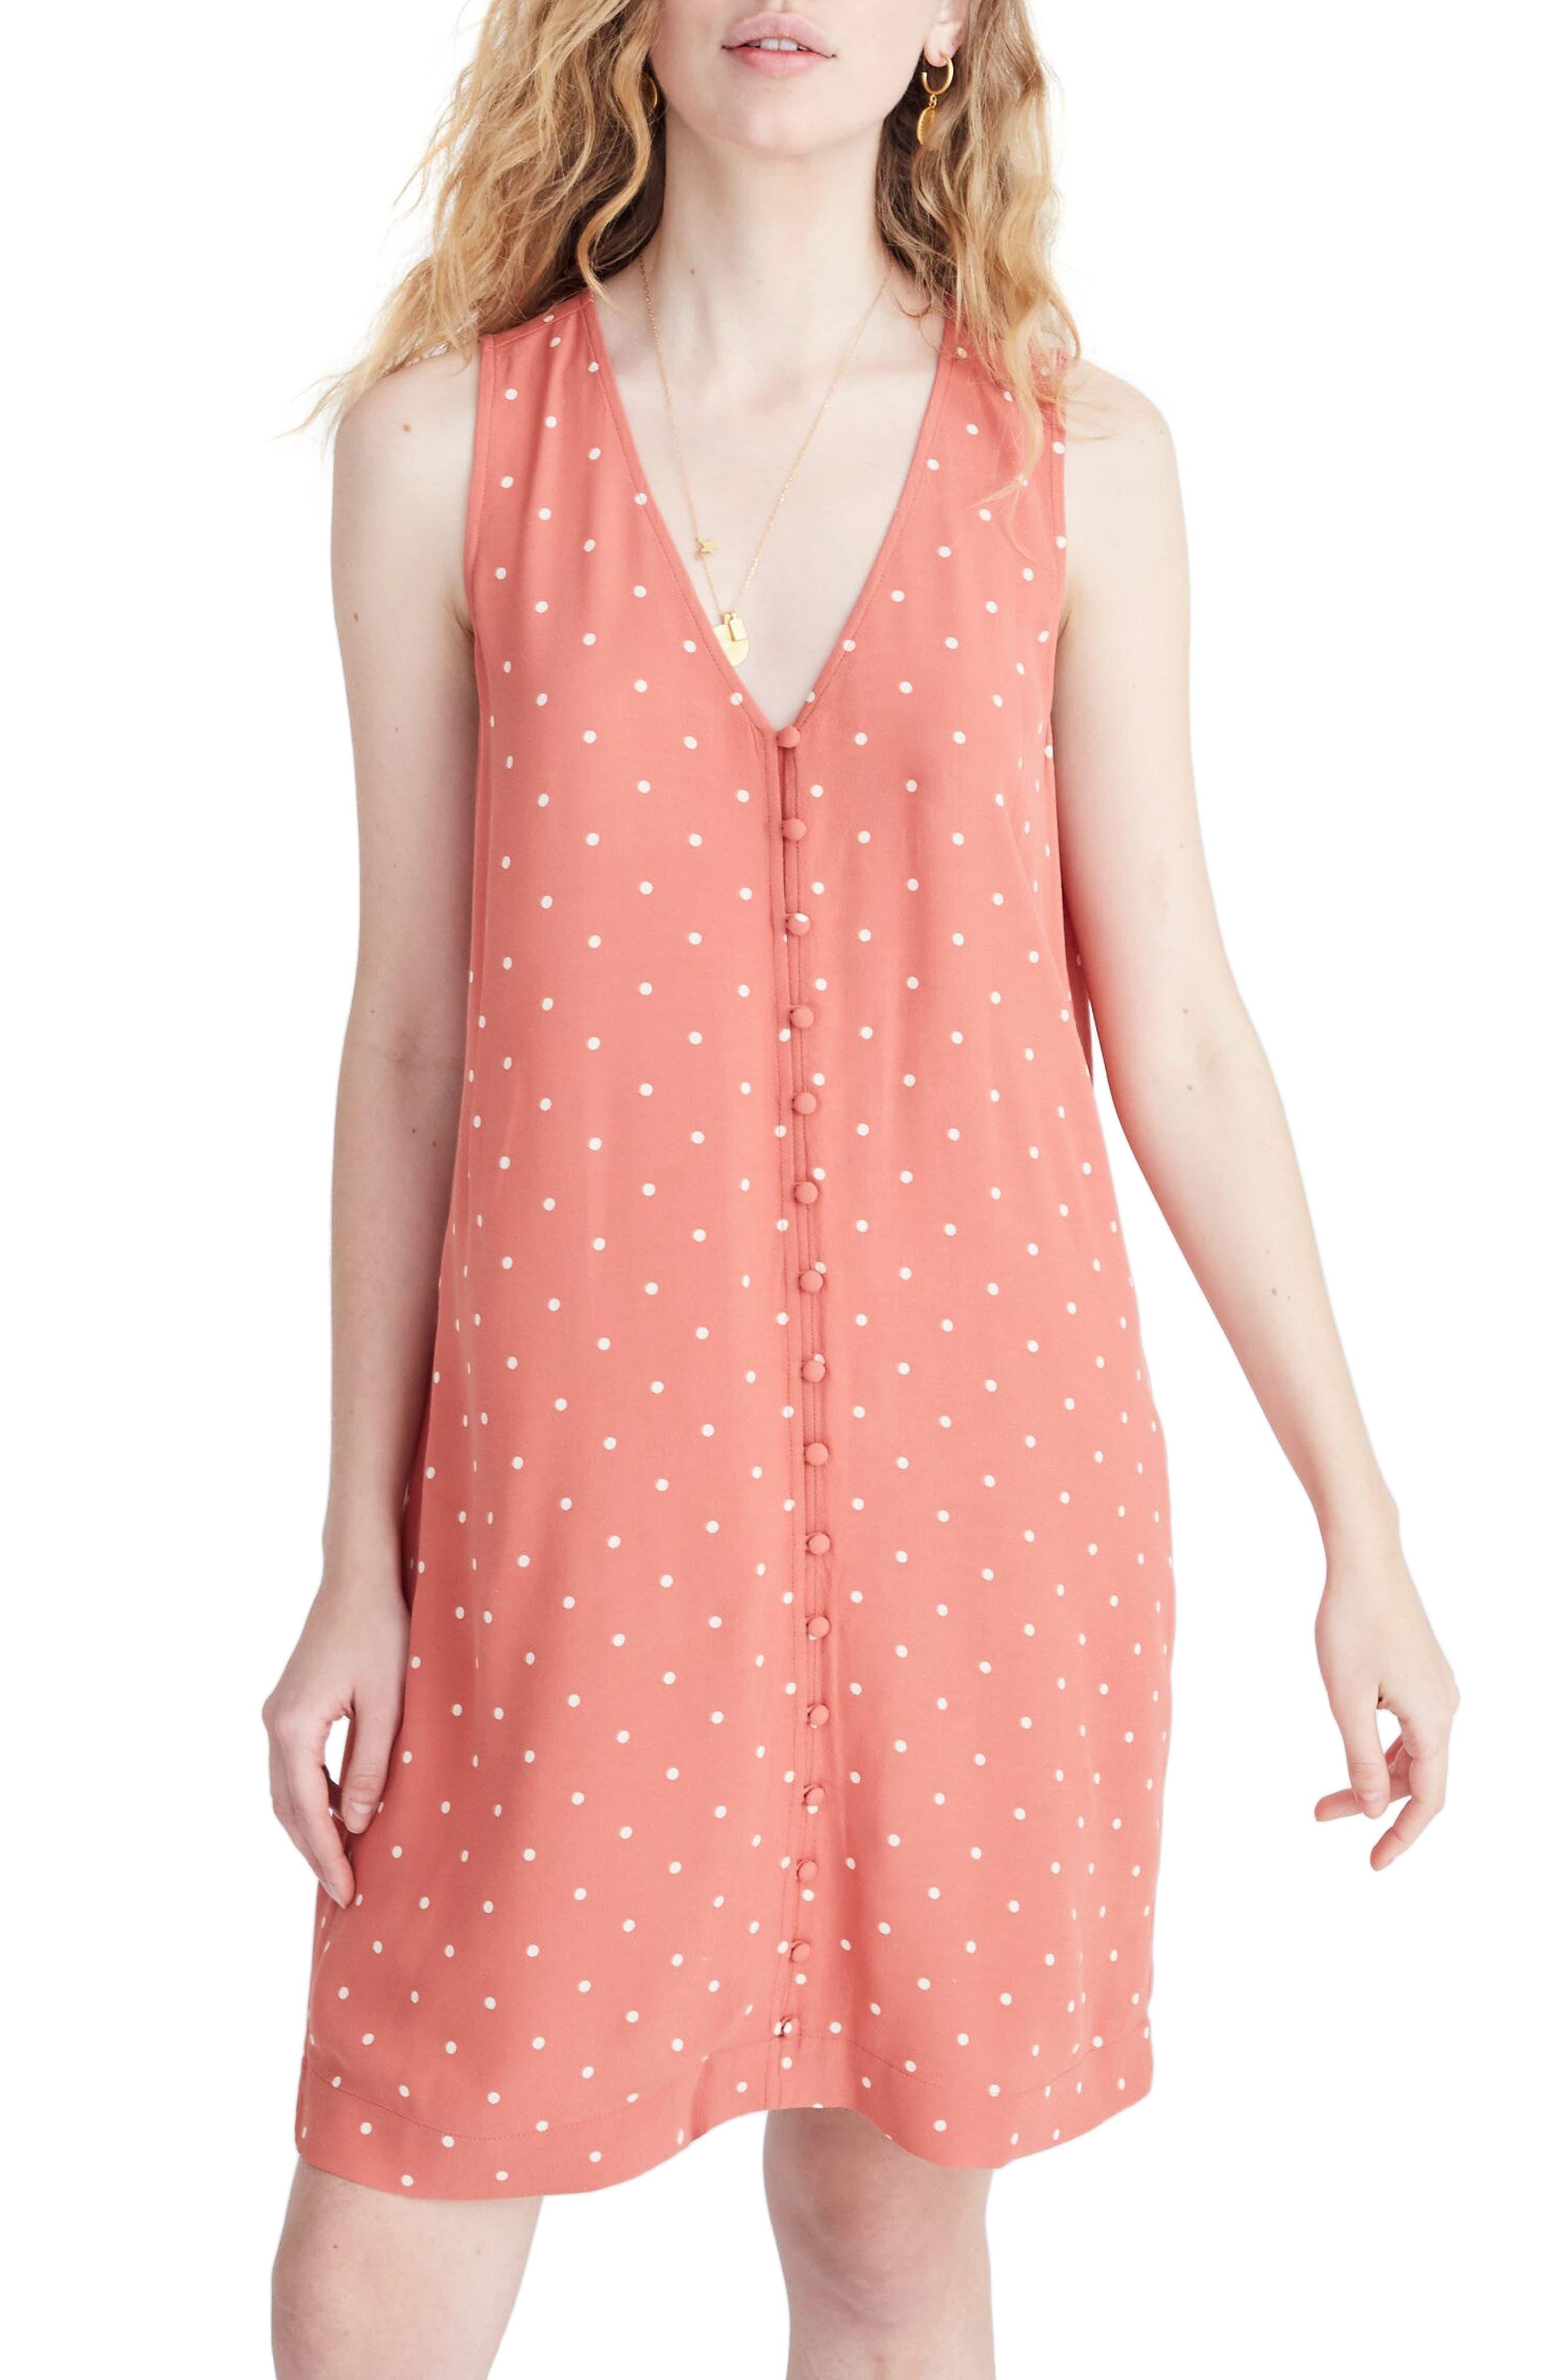 Madewell Polka Dot Heather Button Front Dress, Orange